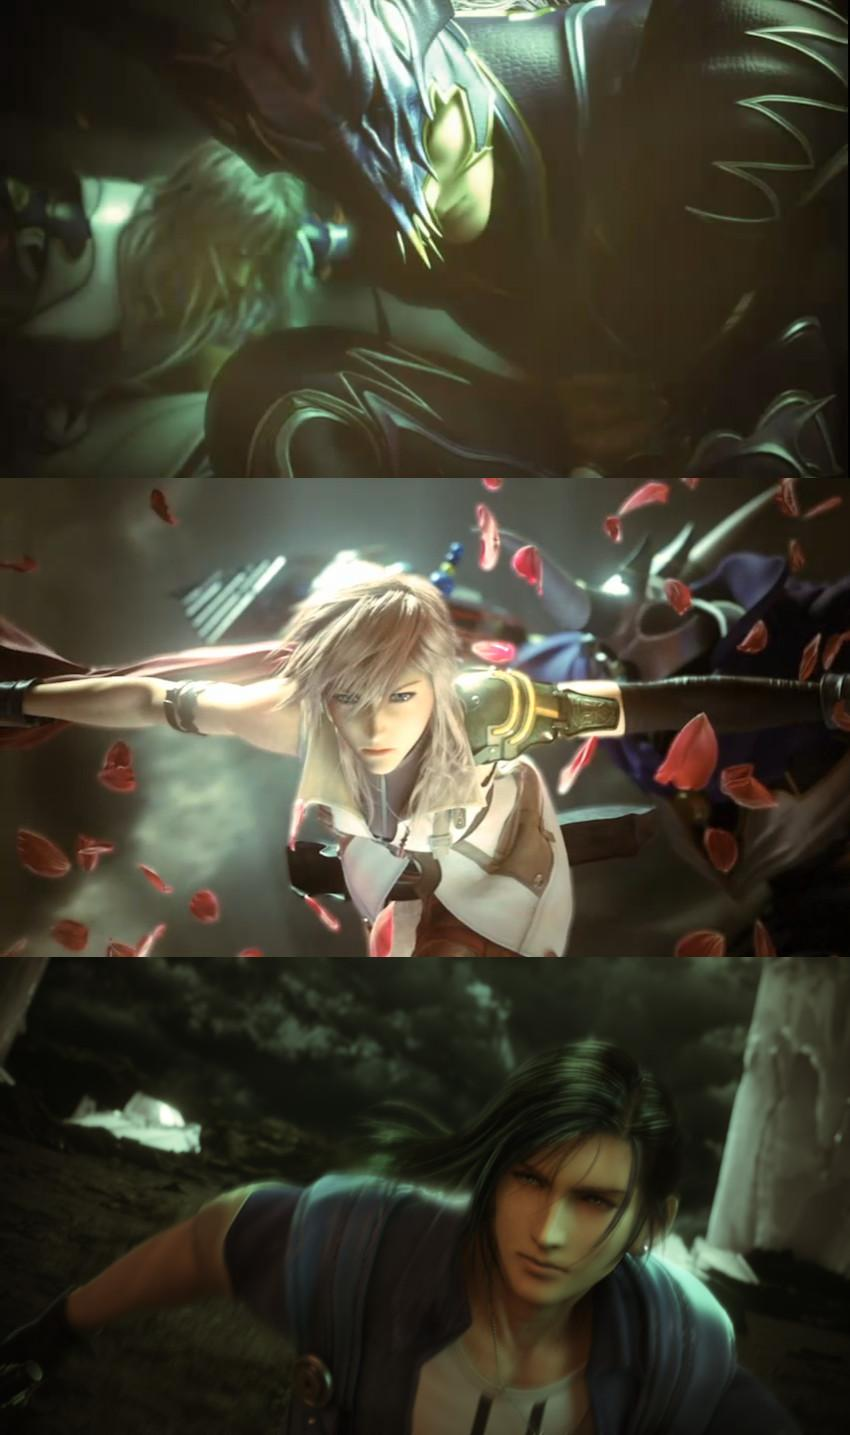 Kain, Lighting, and Laguna from Dissidia 012: Final Fantasy